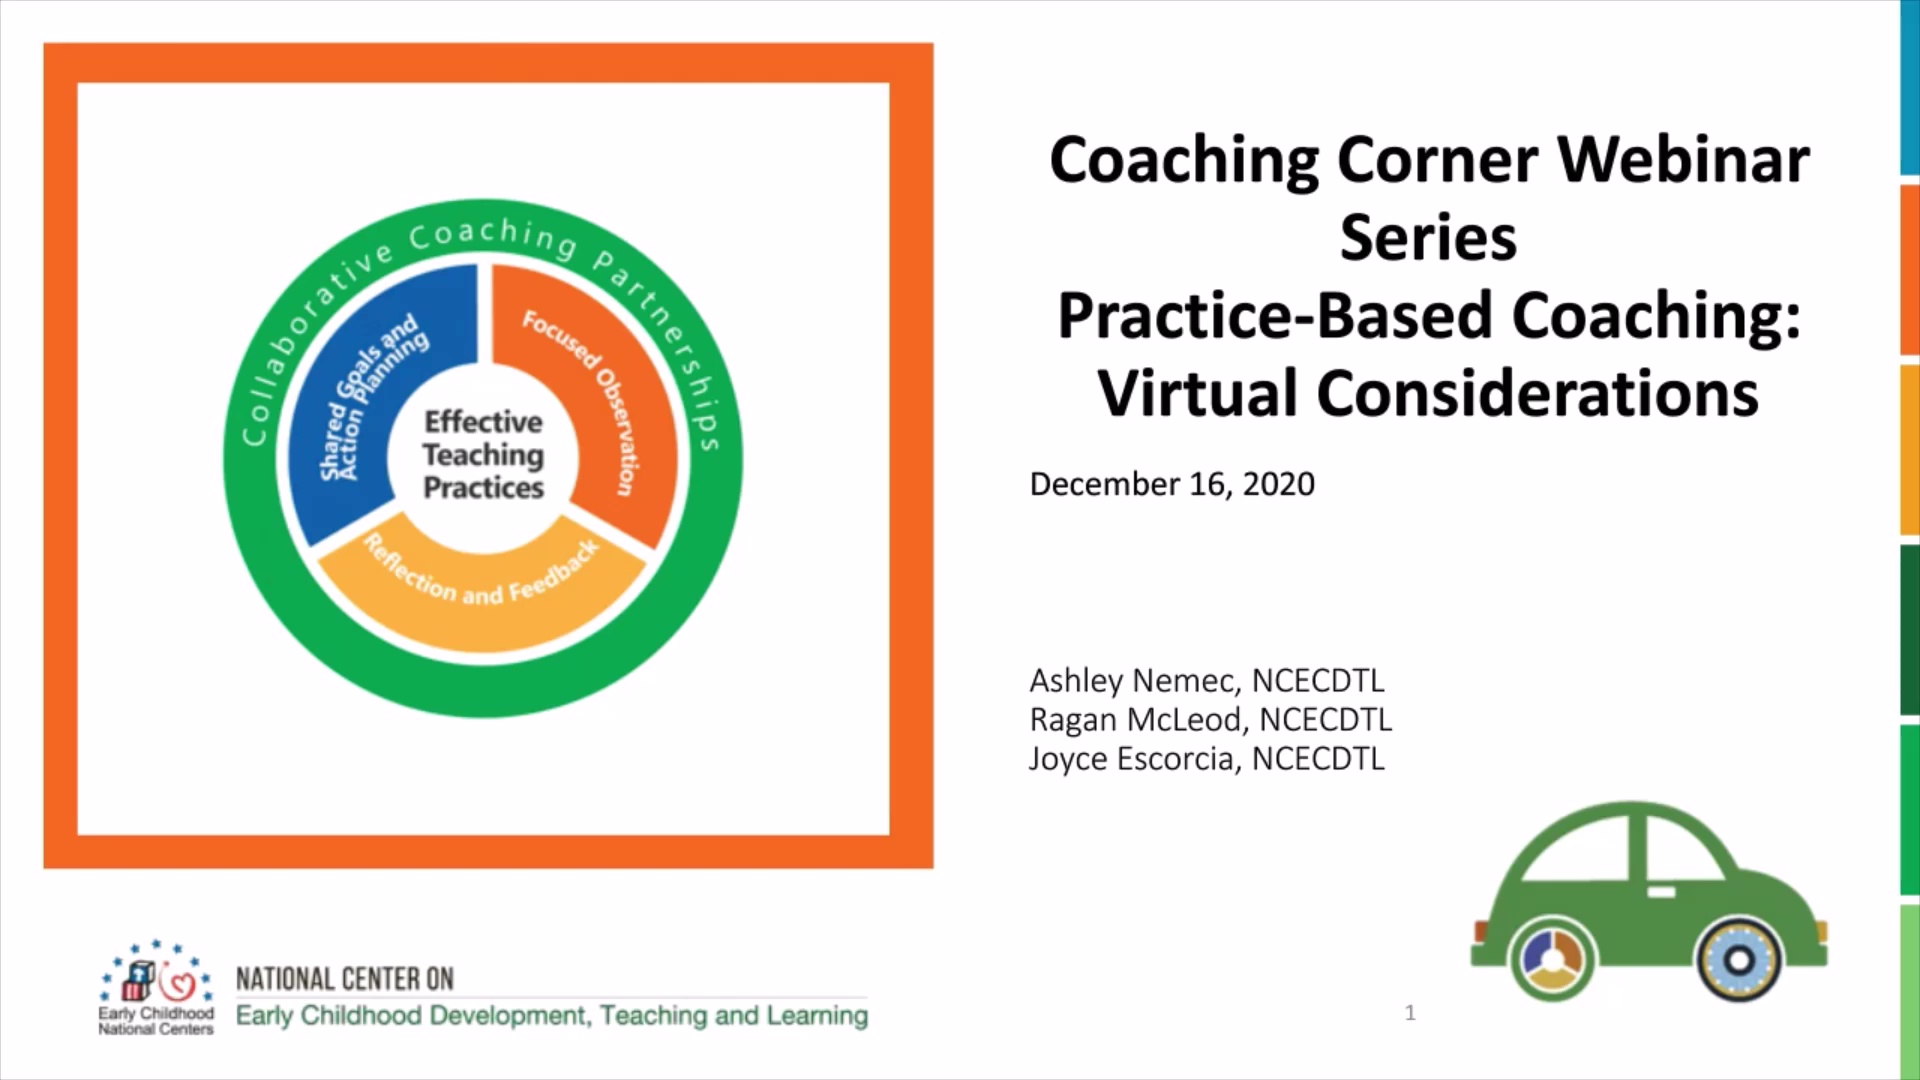 Practice-Based Coaching: Virtual Coaching Considerations